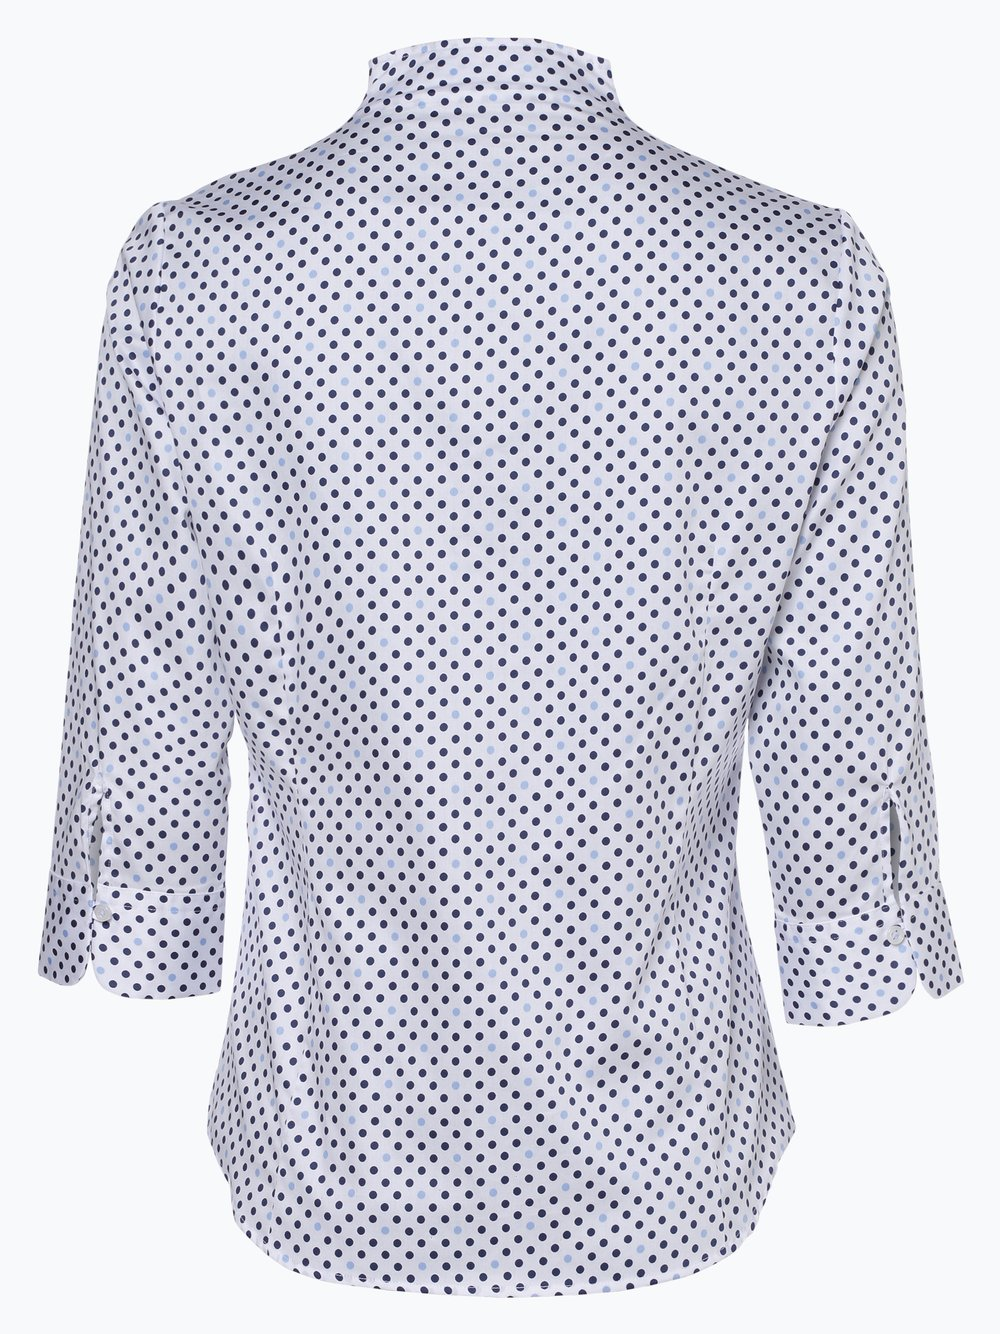 Franco Callegari Damen Bluse-1